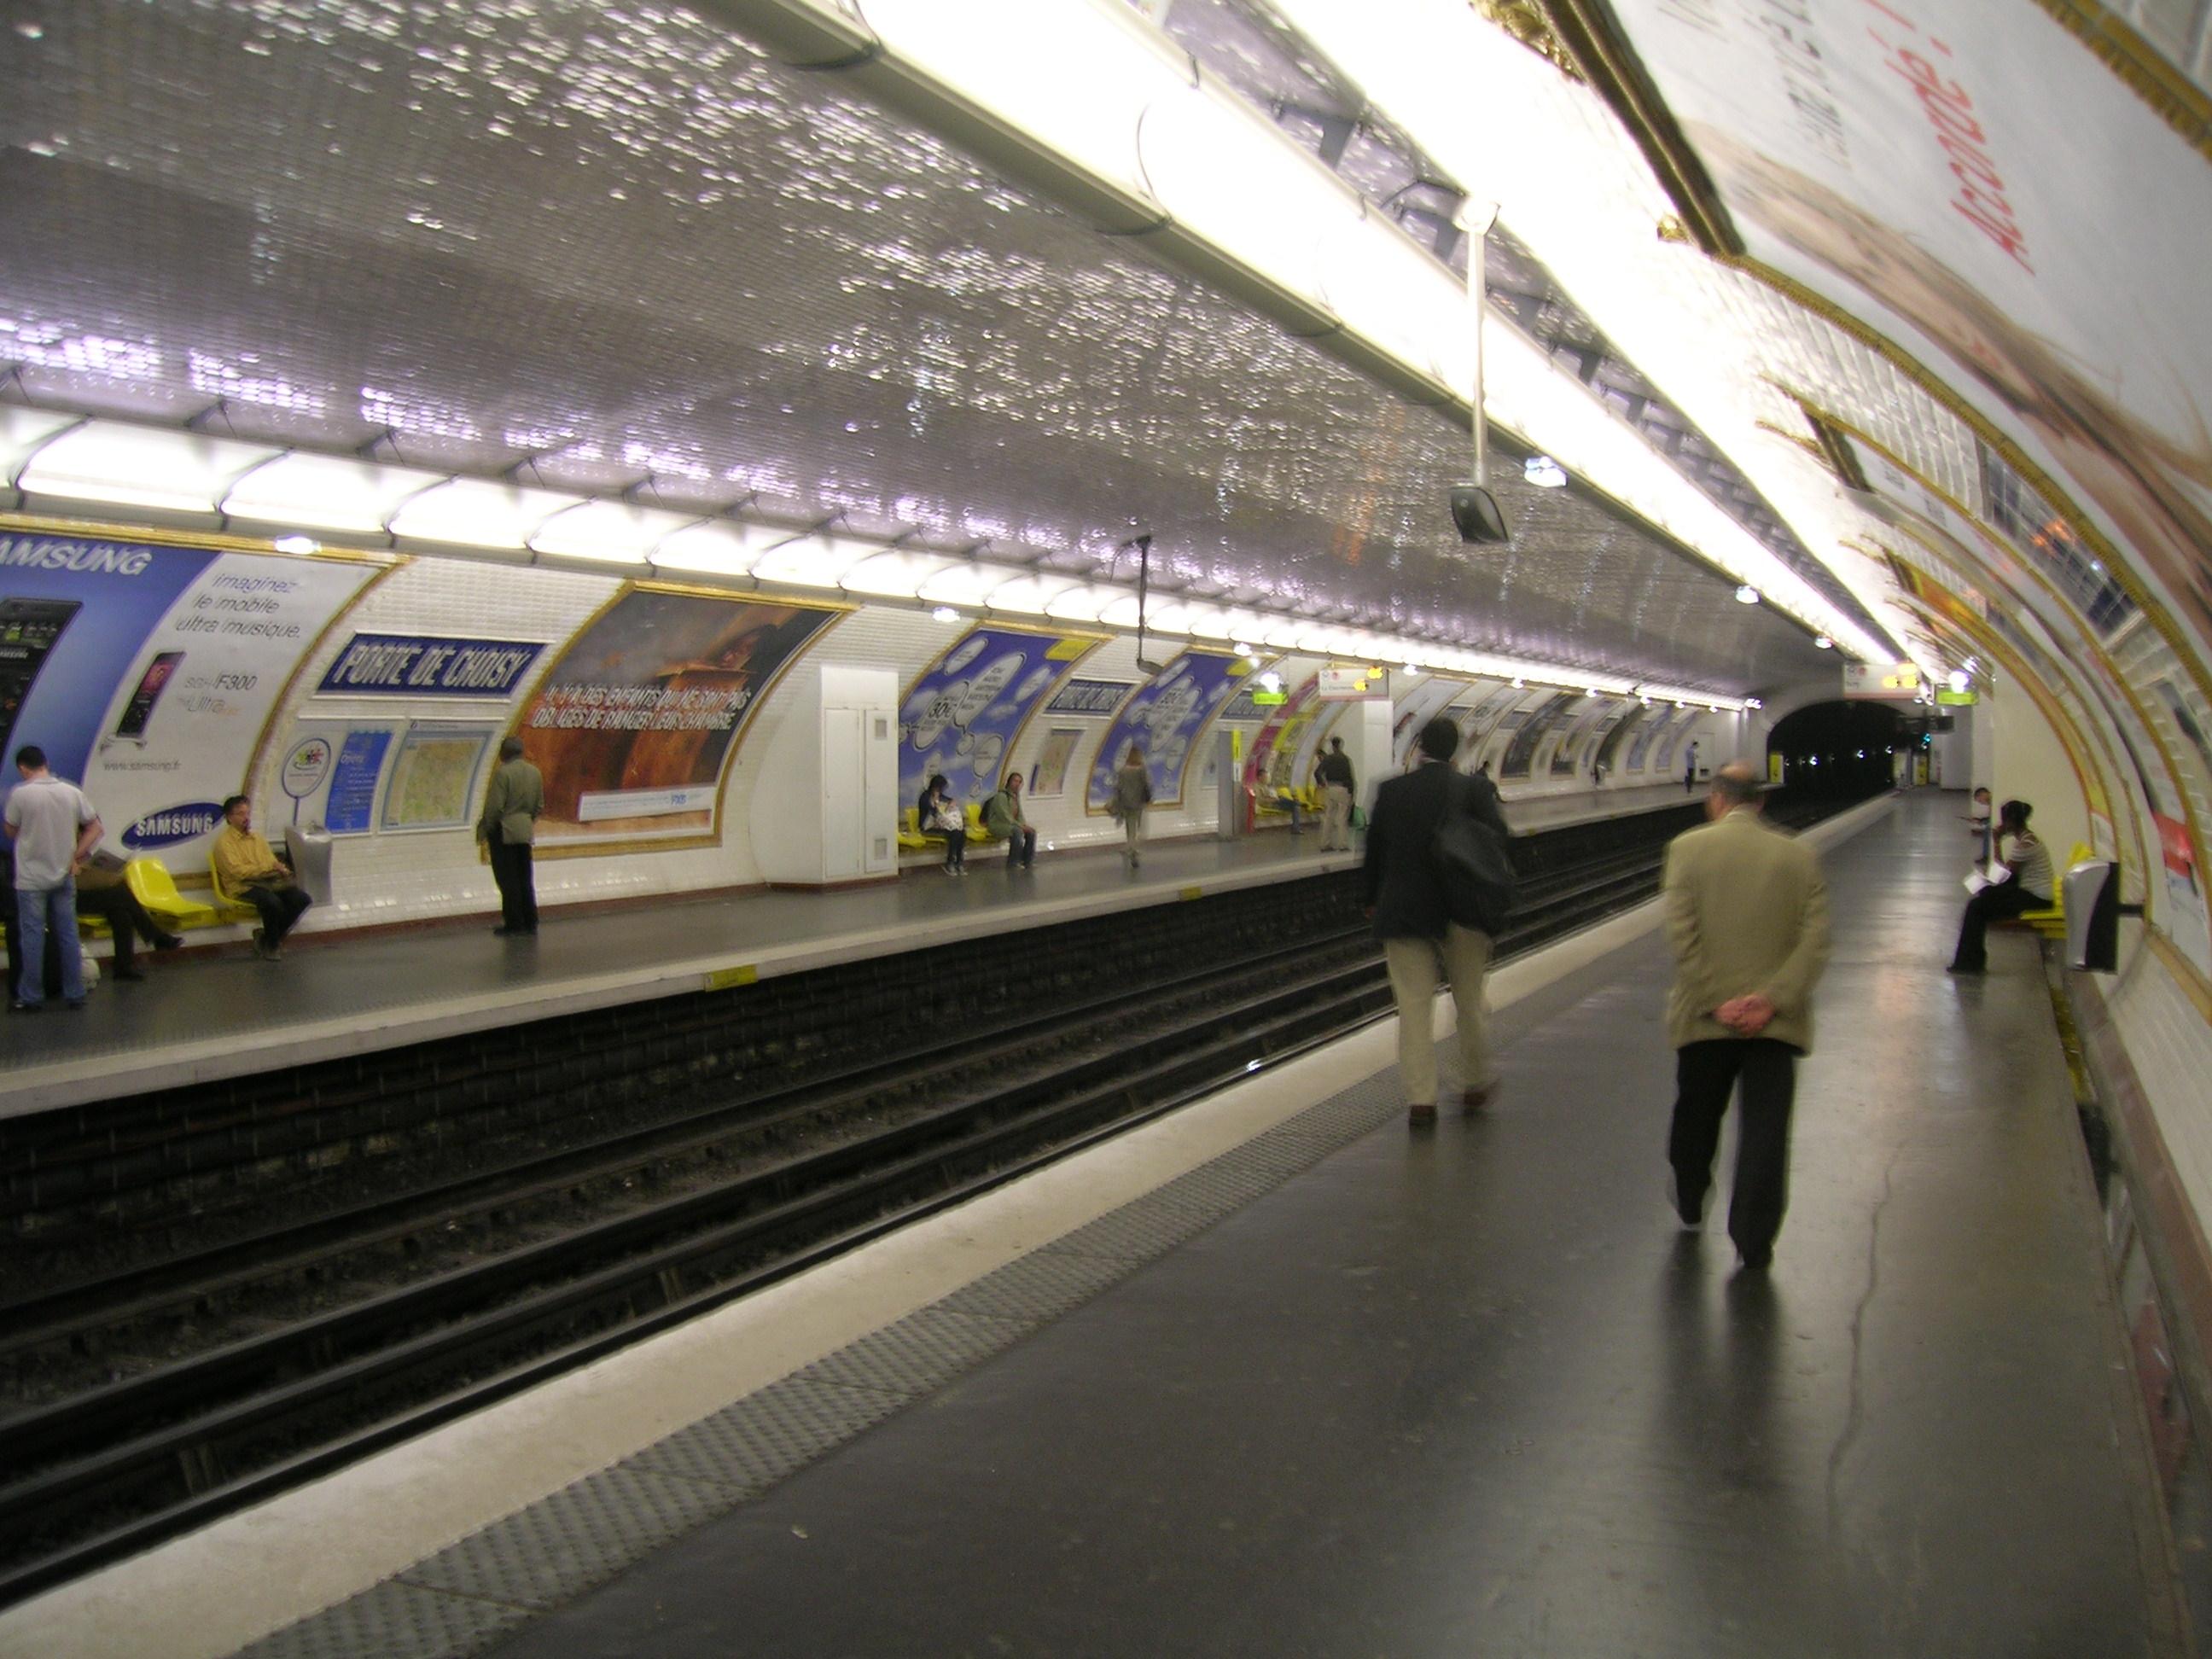 Porte de Choisy (metrostation)